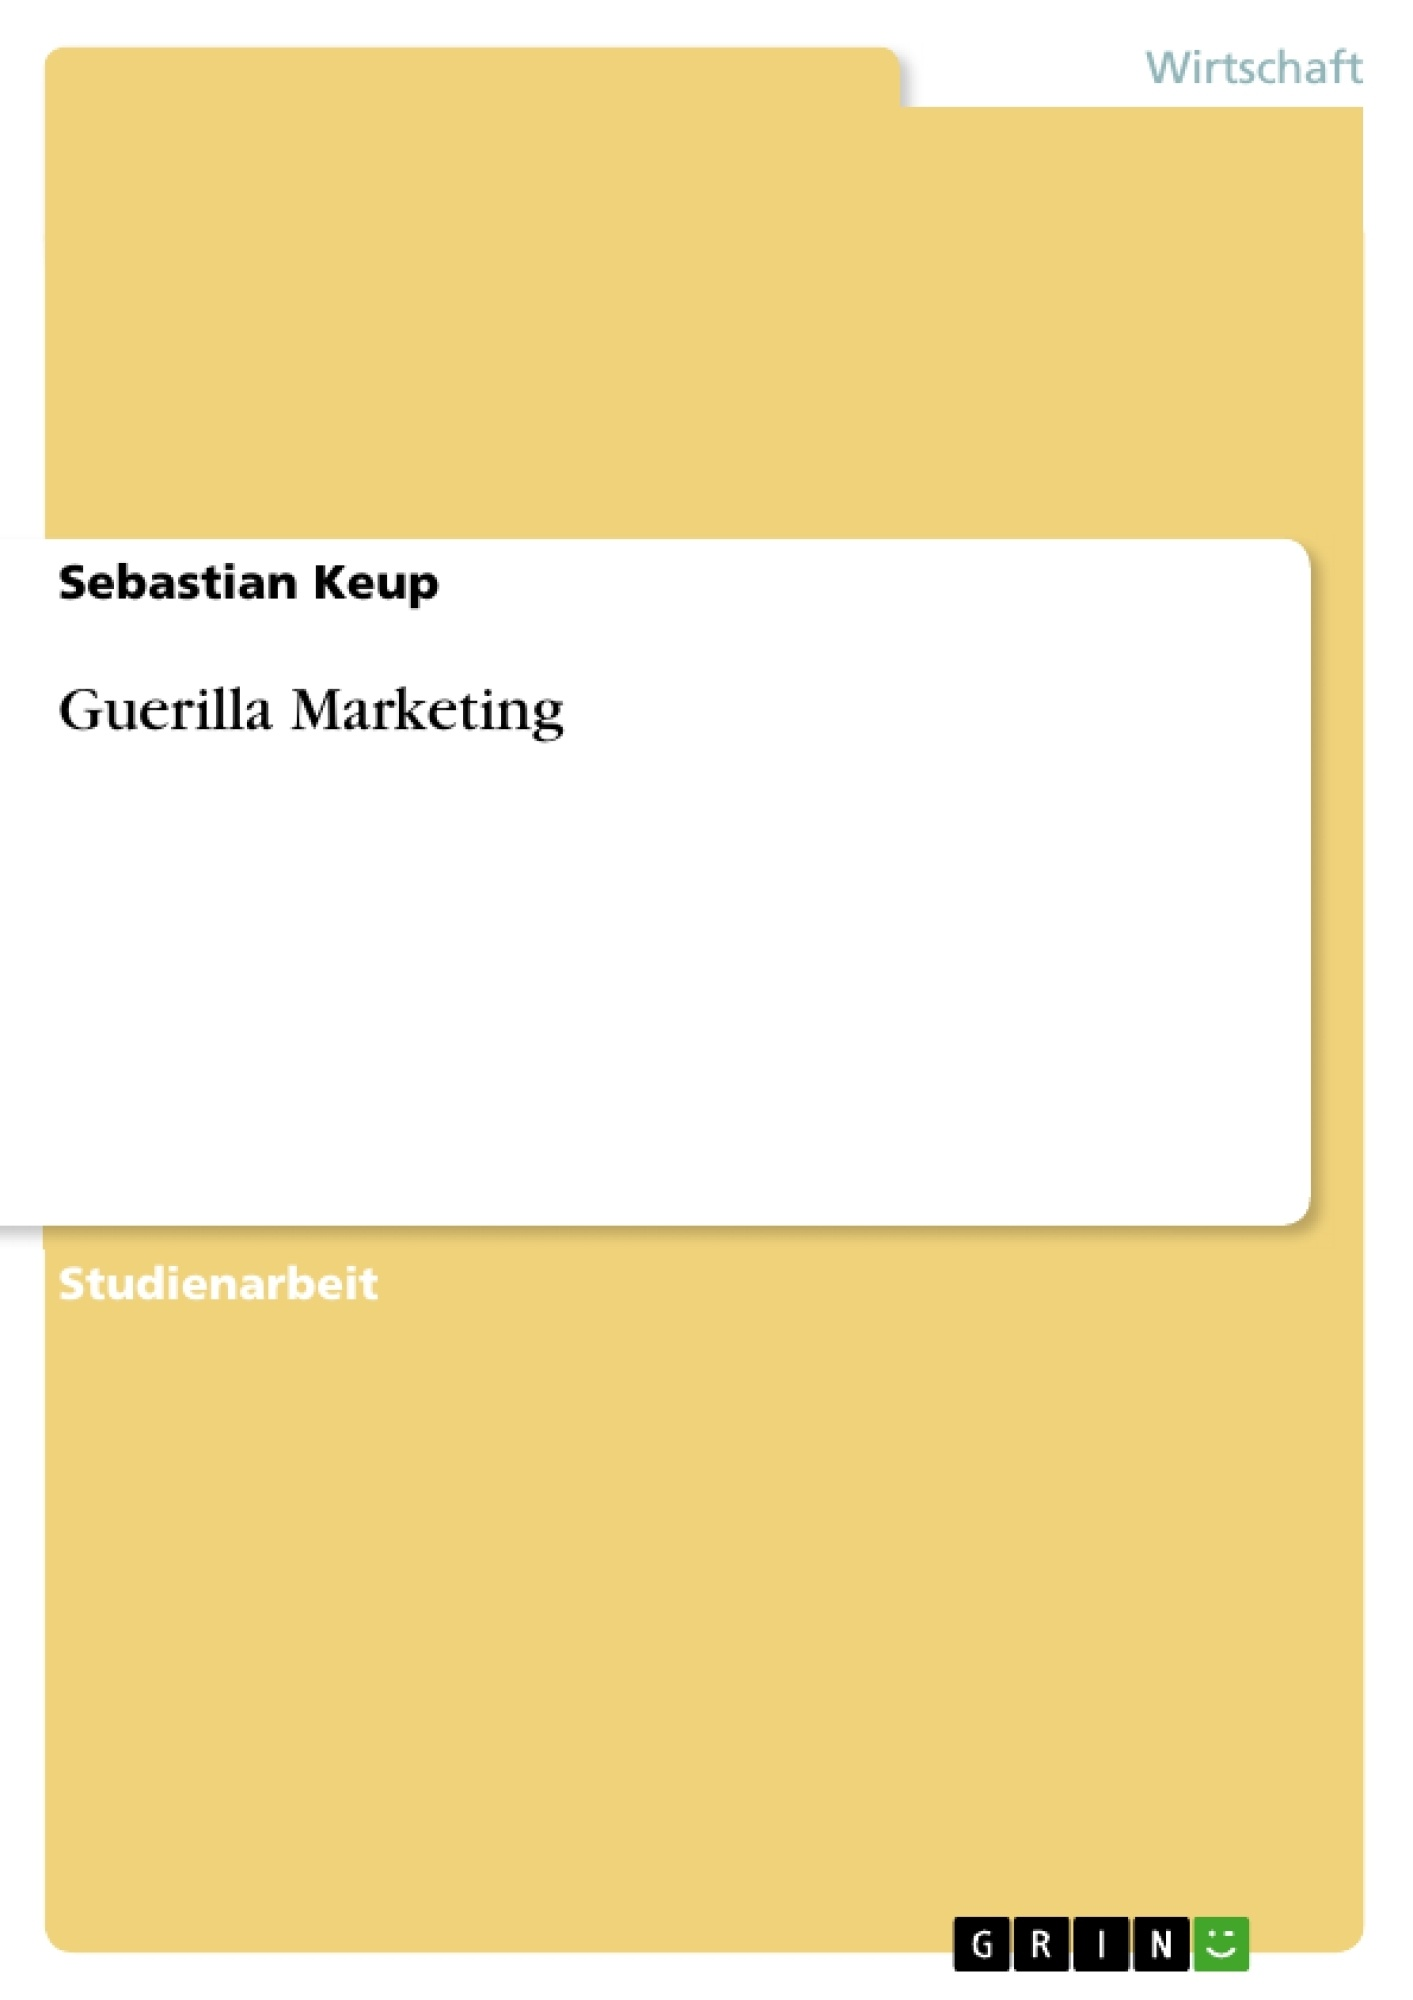 Titel: Guerilla Marketing